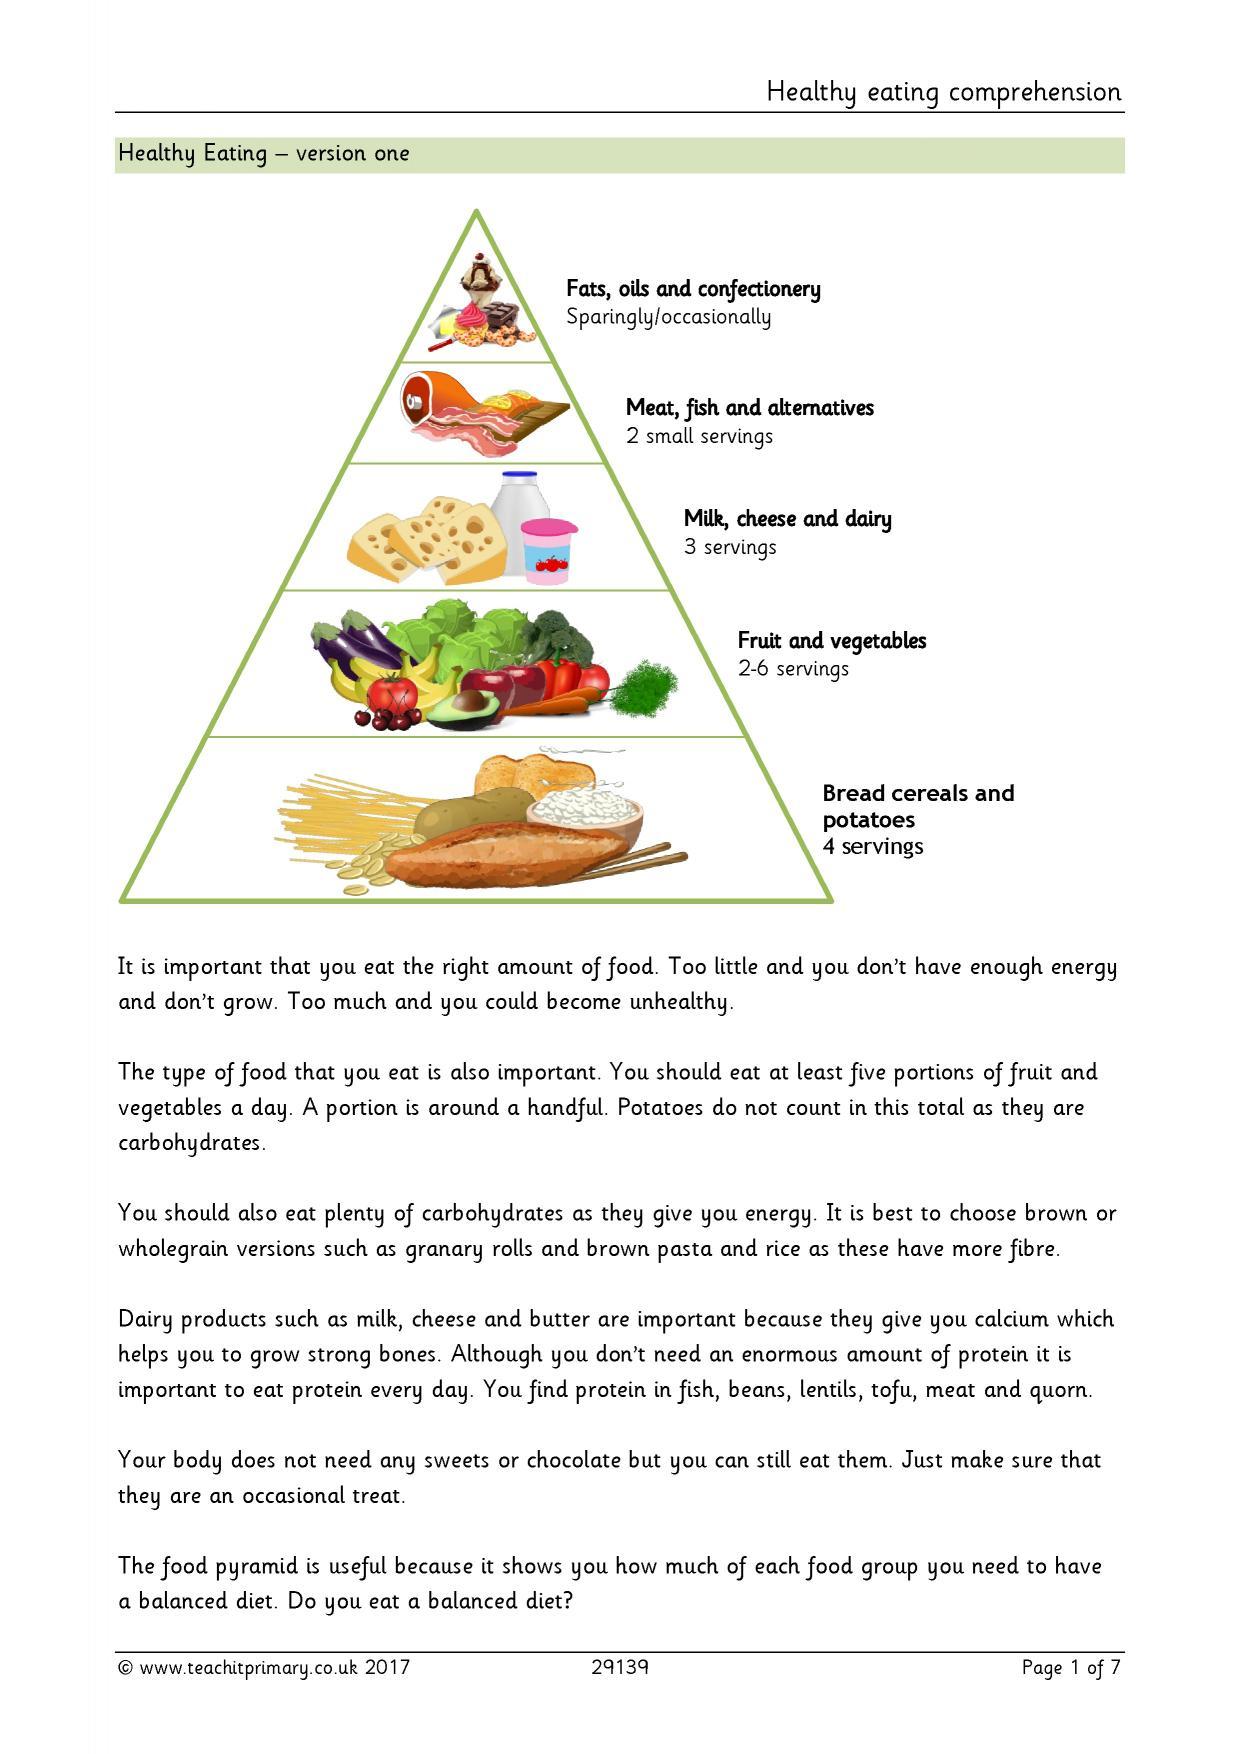 Healthy Eating Comprehension